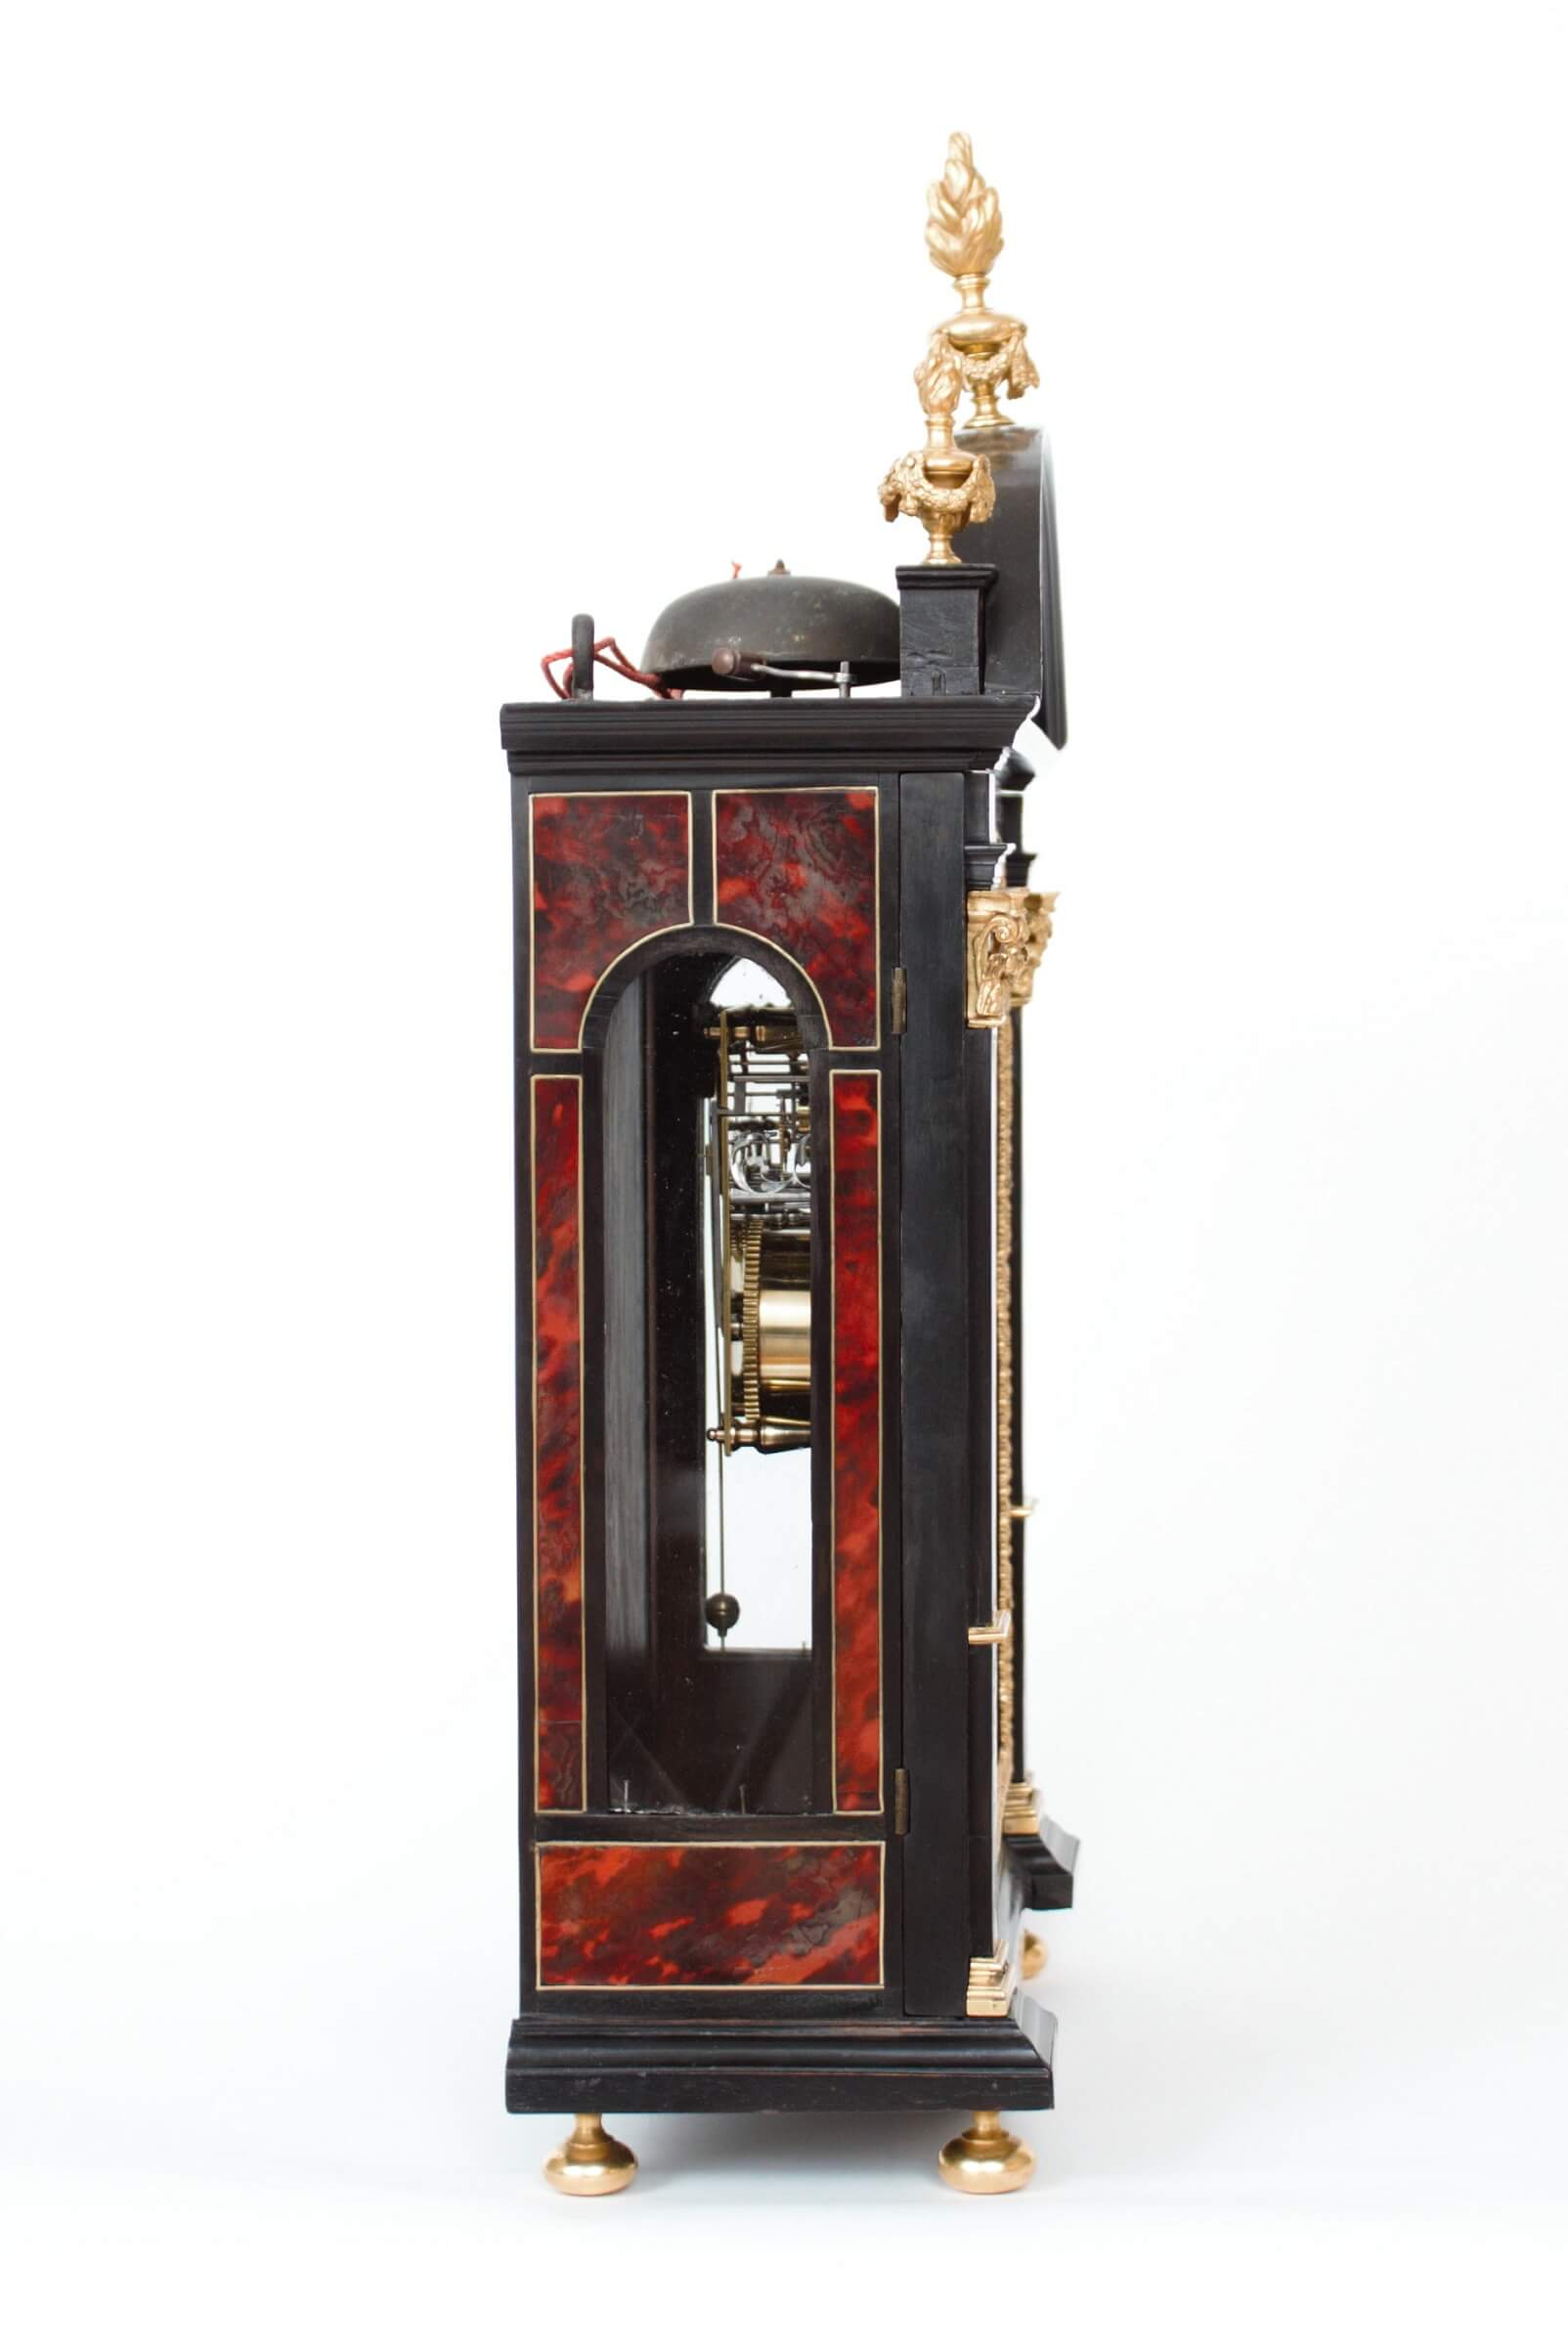 French-Boulle-ormolu-ebony-religieuse-antique-clock-Louis XIV-Gabriel Dumas-Paris